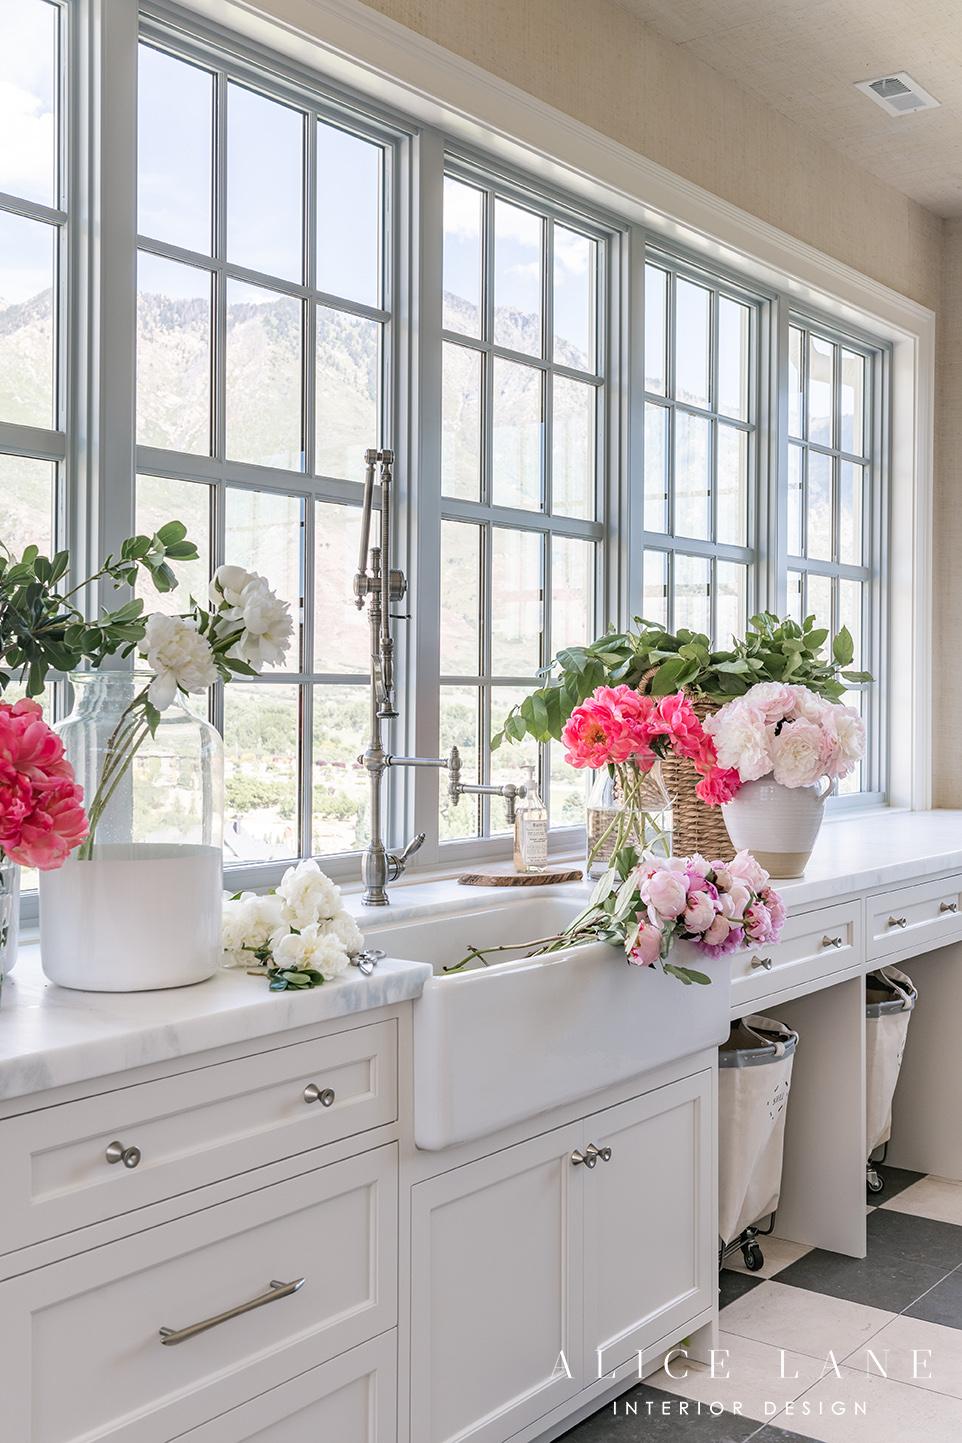 Rachel Parcell's Laundry Room   Alice Lane Interior Design   Photo by Rebekah Westover